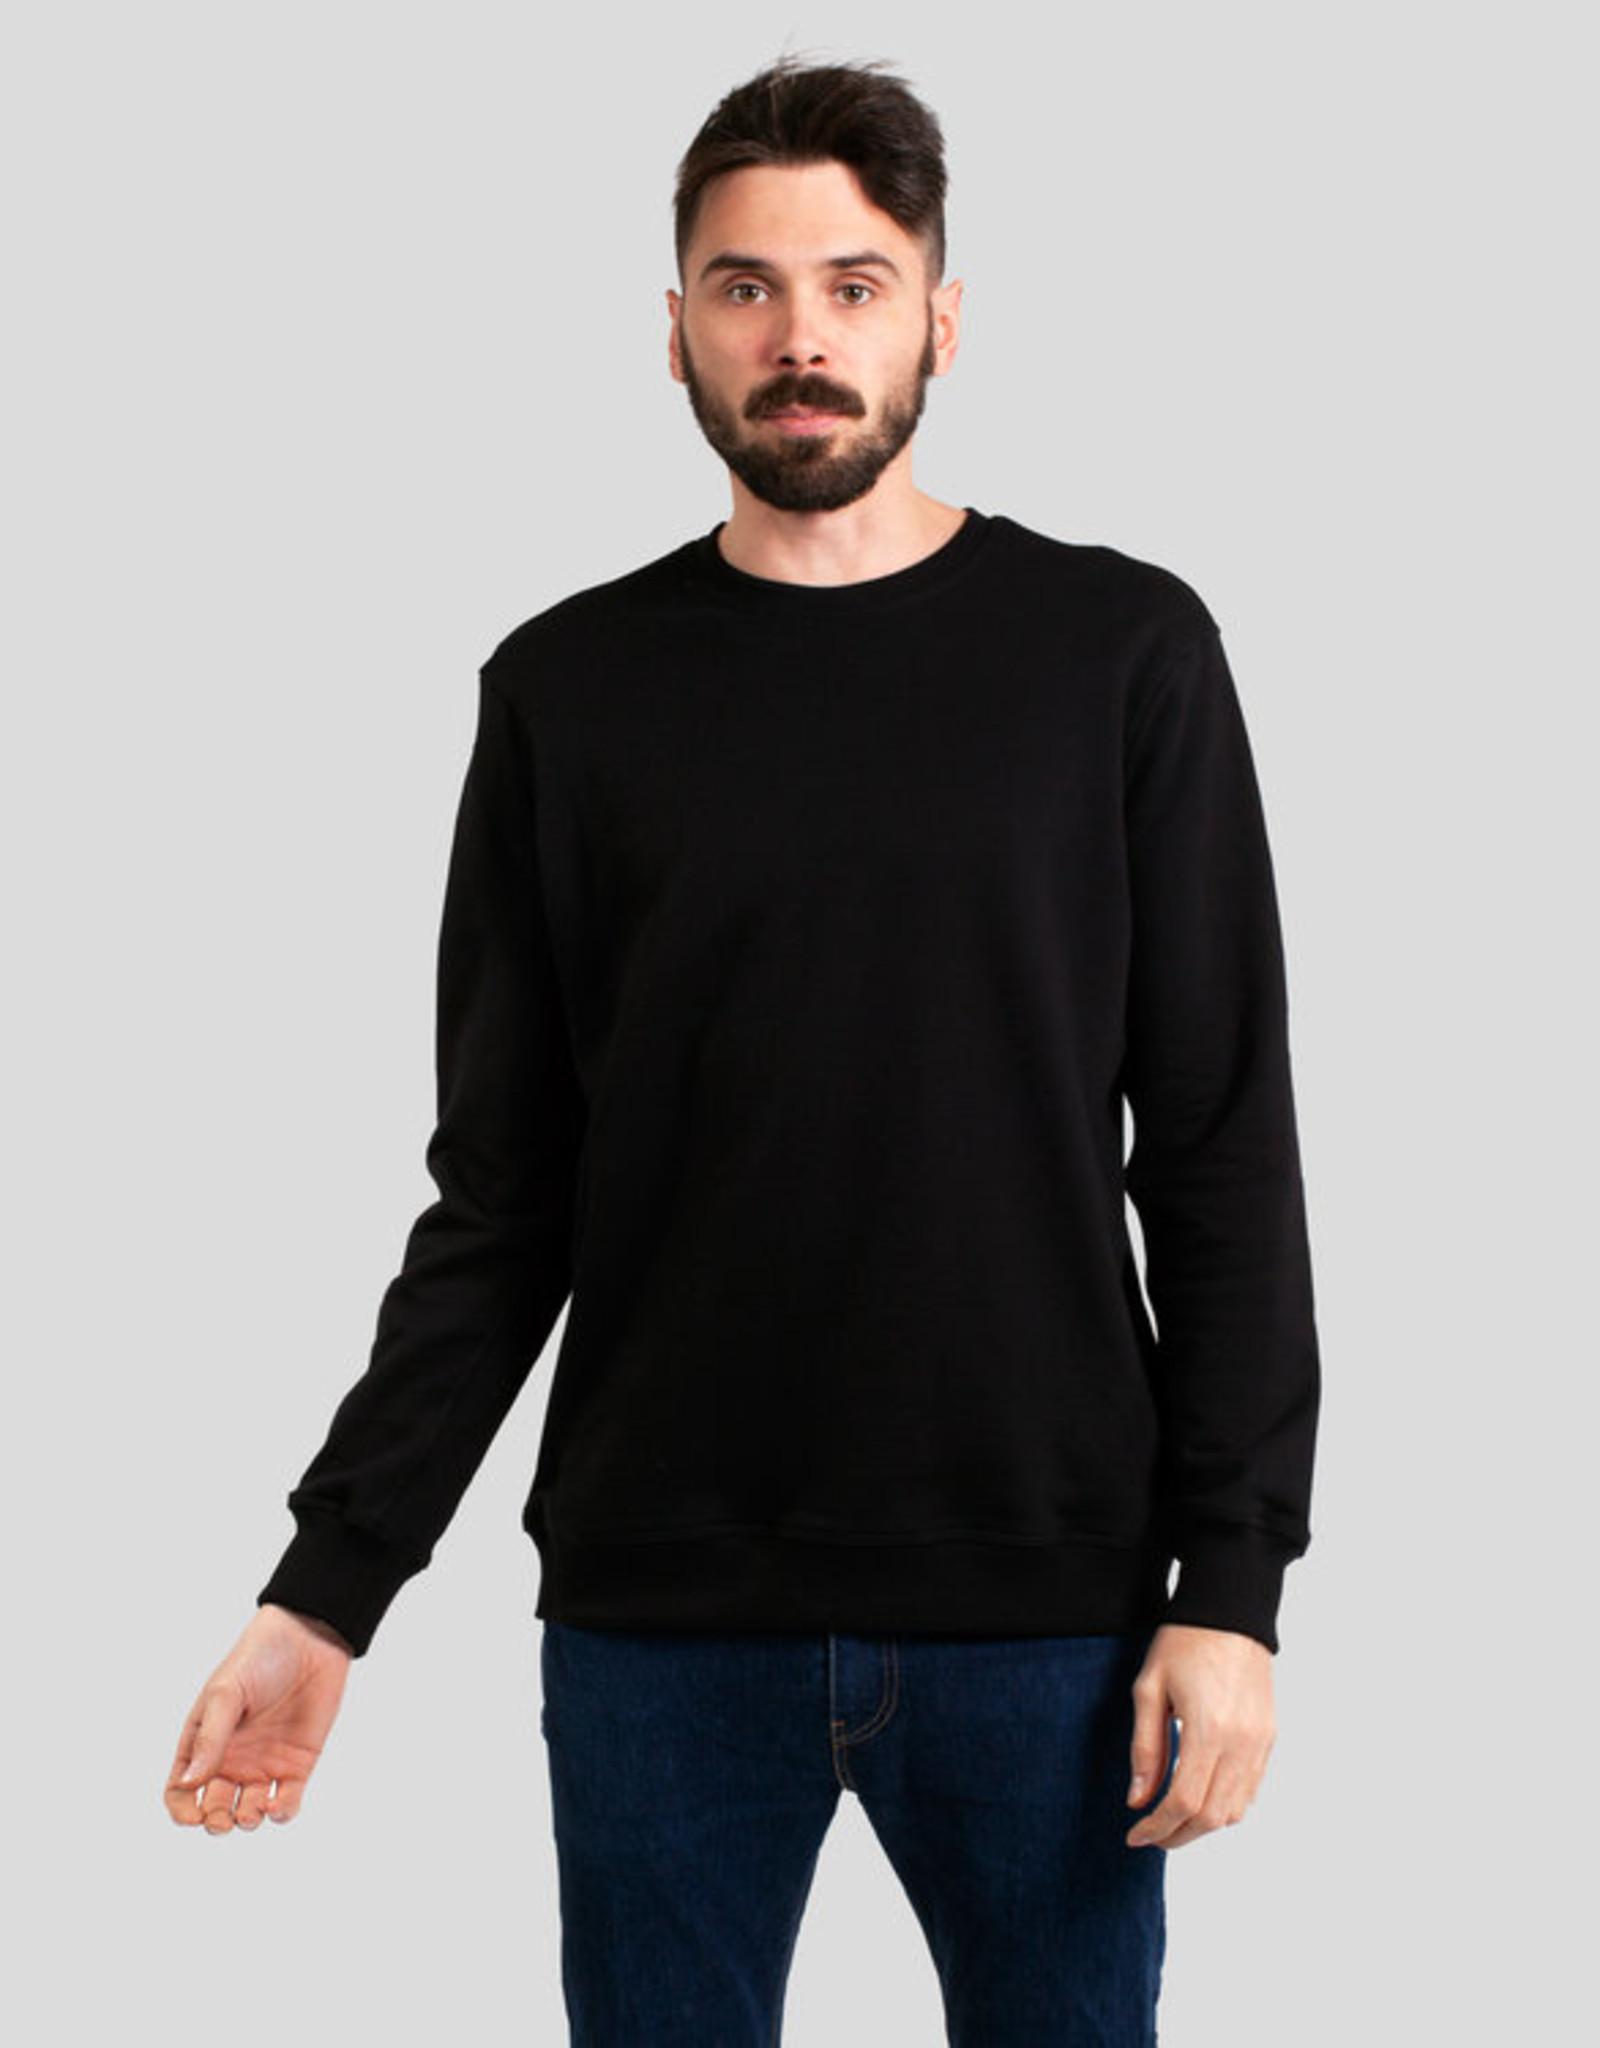 Nil - Sweatshirt Classique - Noir